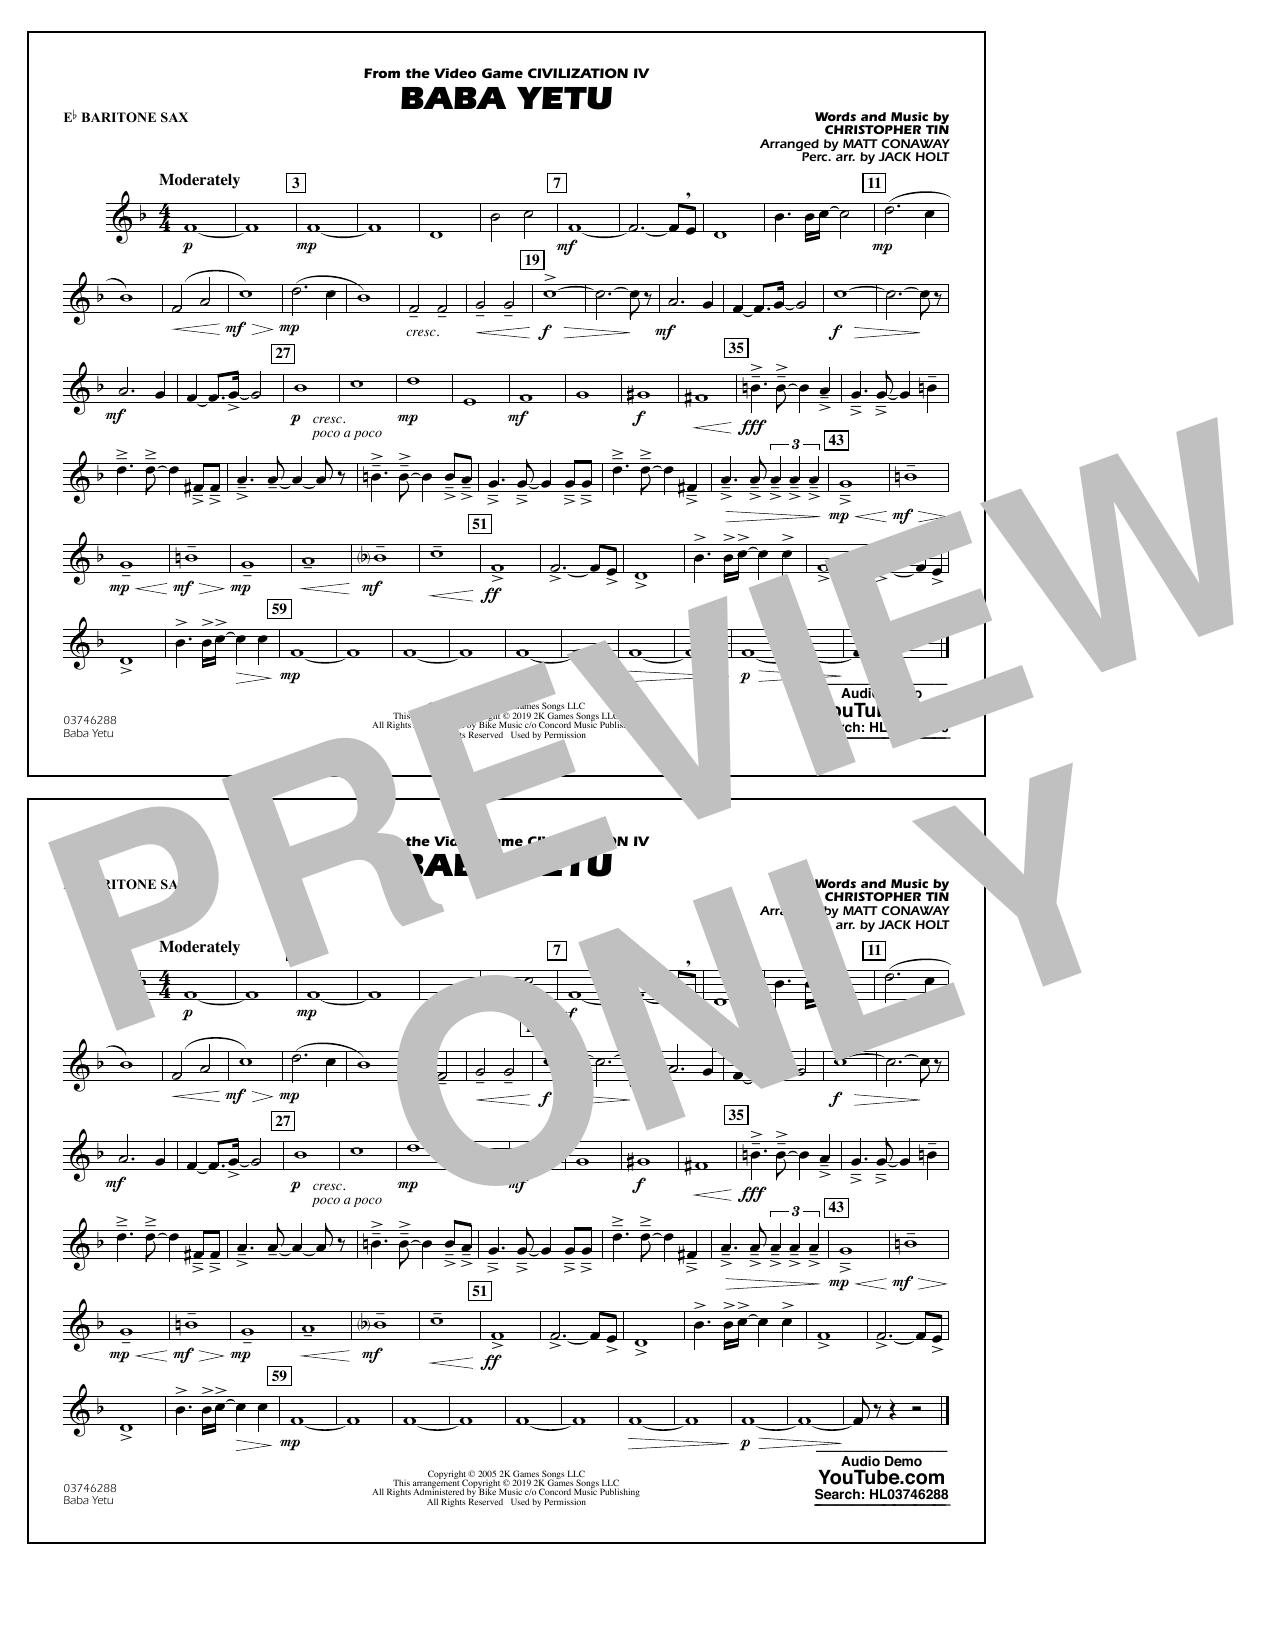 Baba Yetu (from Civilization IV) (arr. Matt Conaway) - Eb Baritone Sax (Marching Band)